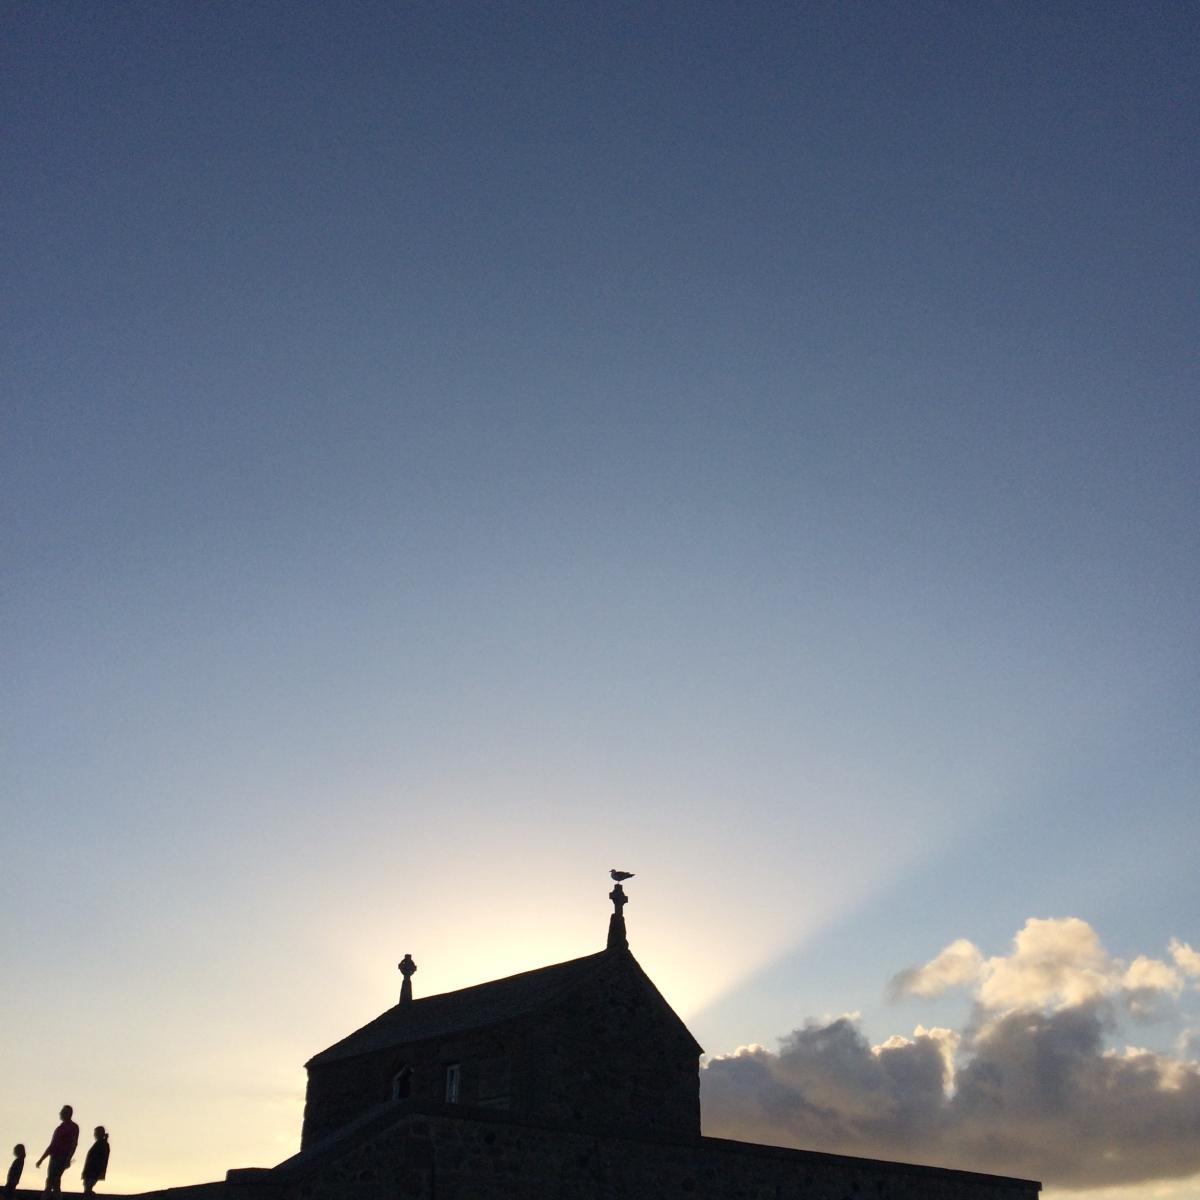 The Island Chapel or St Nicholas Chapel, St. Ives